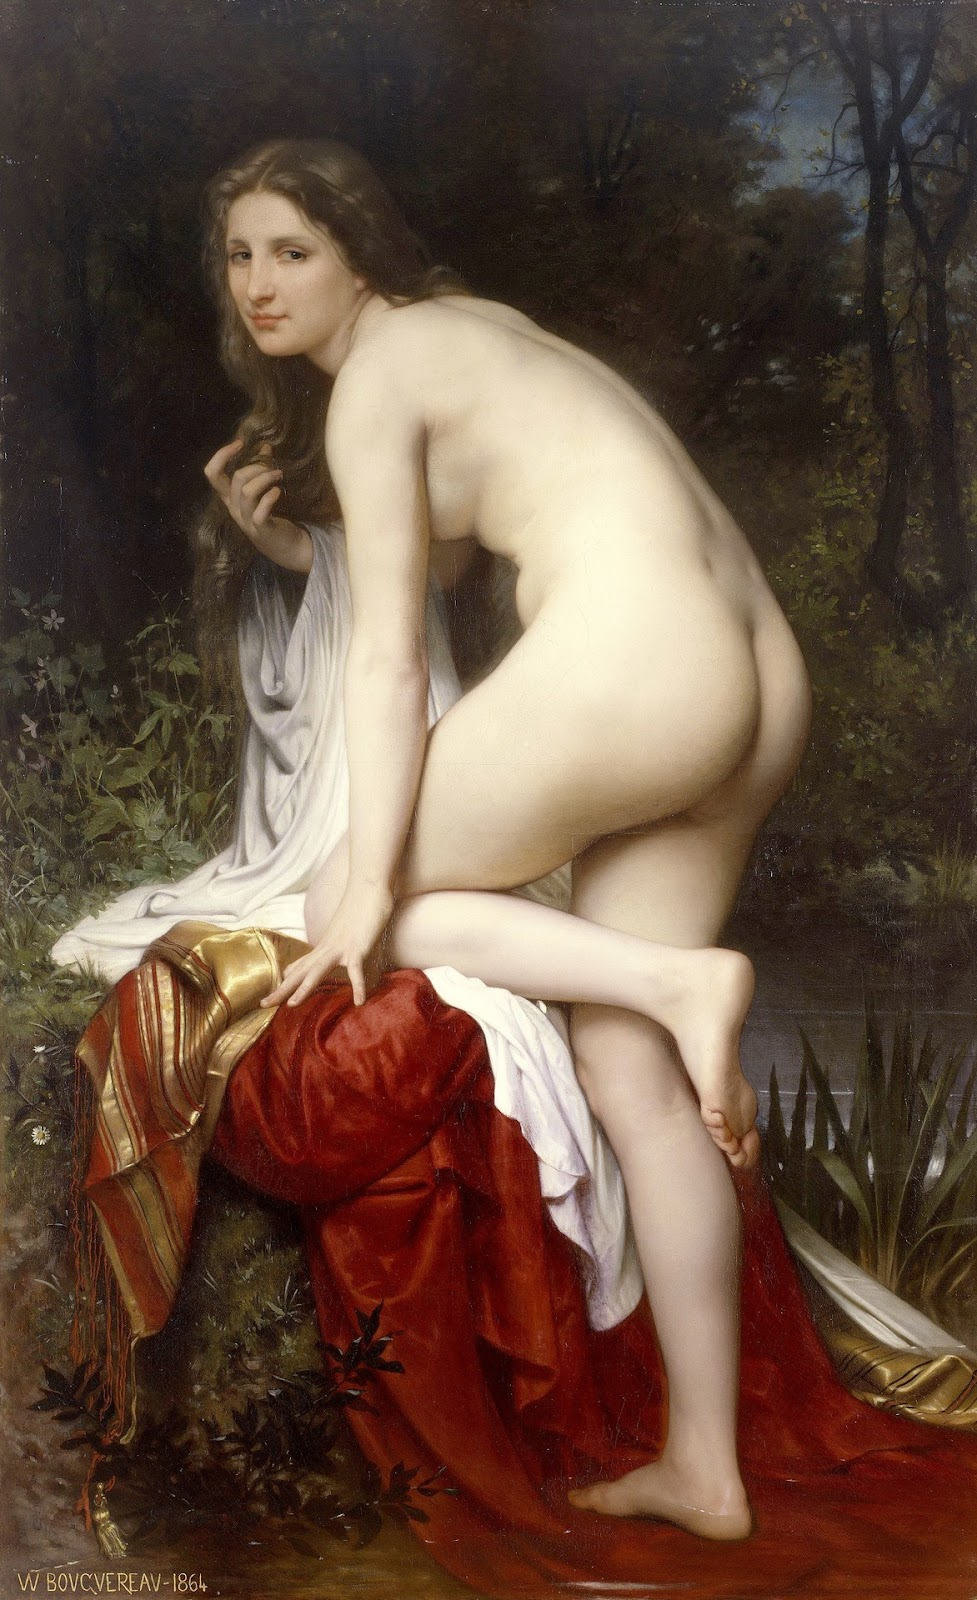 Woman Bathing. 1864. Óleo sobre tela - 166 х 103 см